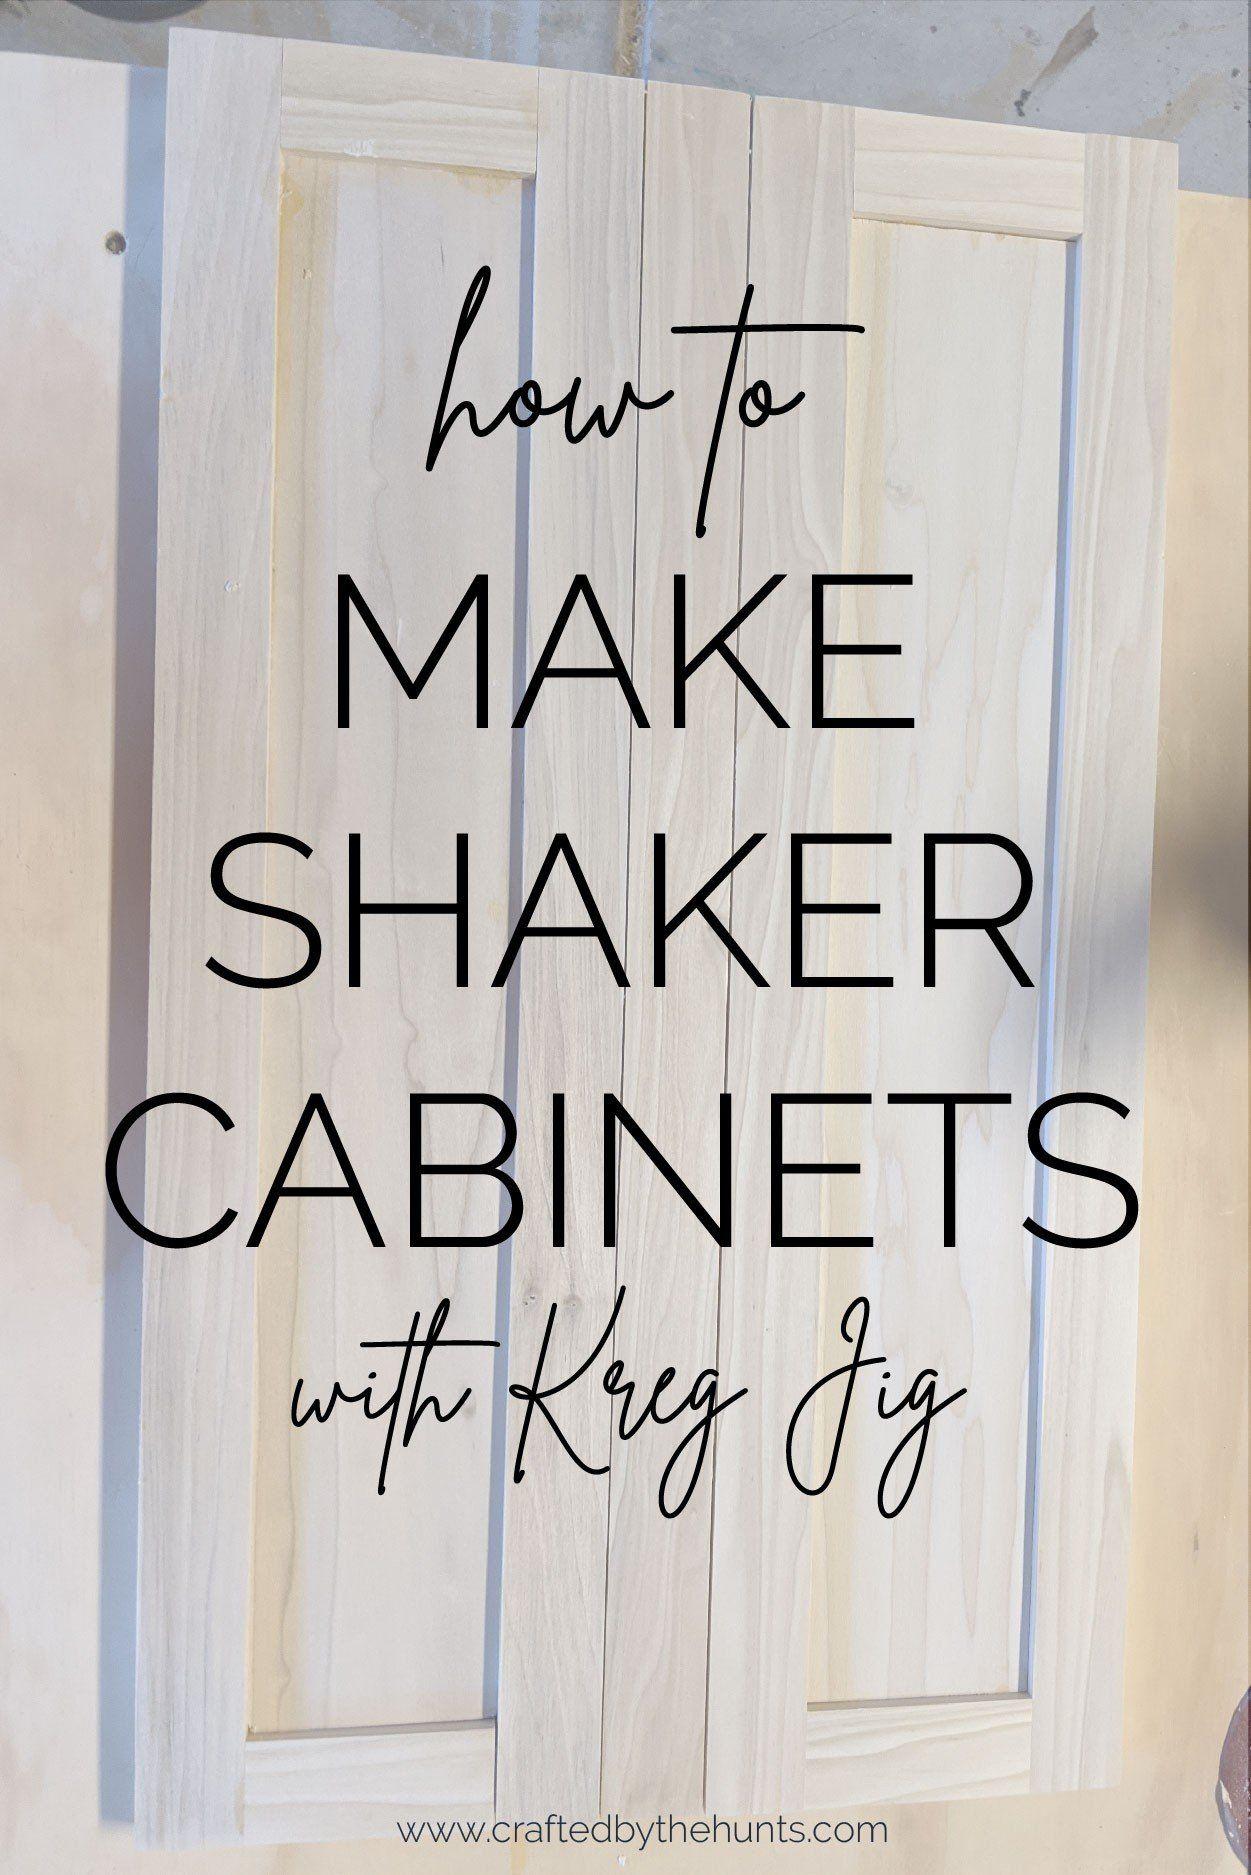 How To Make Shaker Cabinet Doors With Kreg Jig Crafted By The Hunts In 2020 Shaker Cabinet Doors Shaker Style Cabinet Doors Diy Cabinet Doors